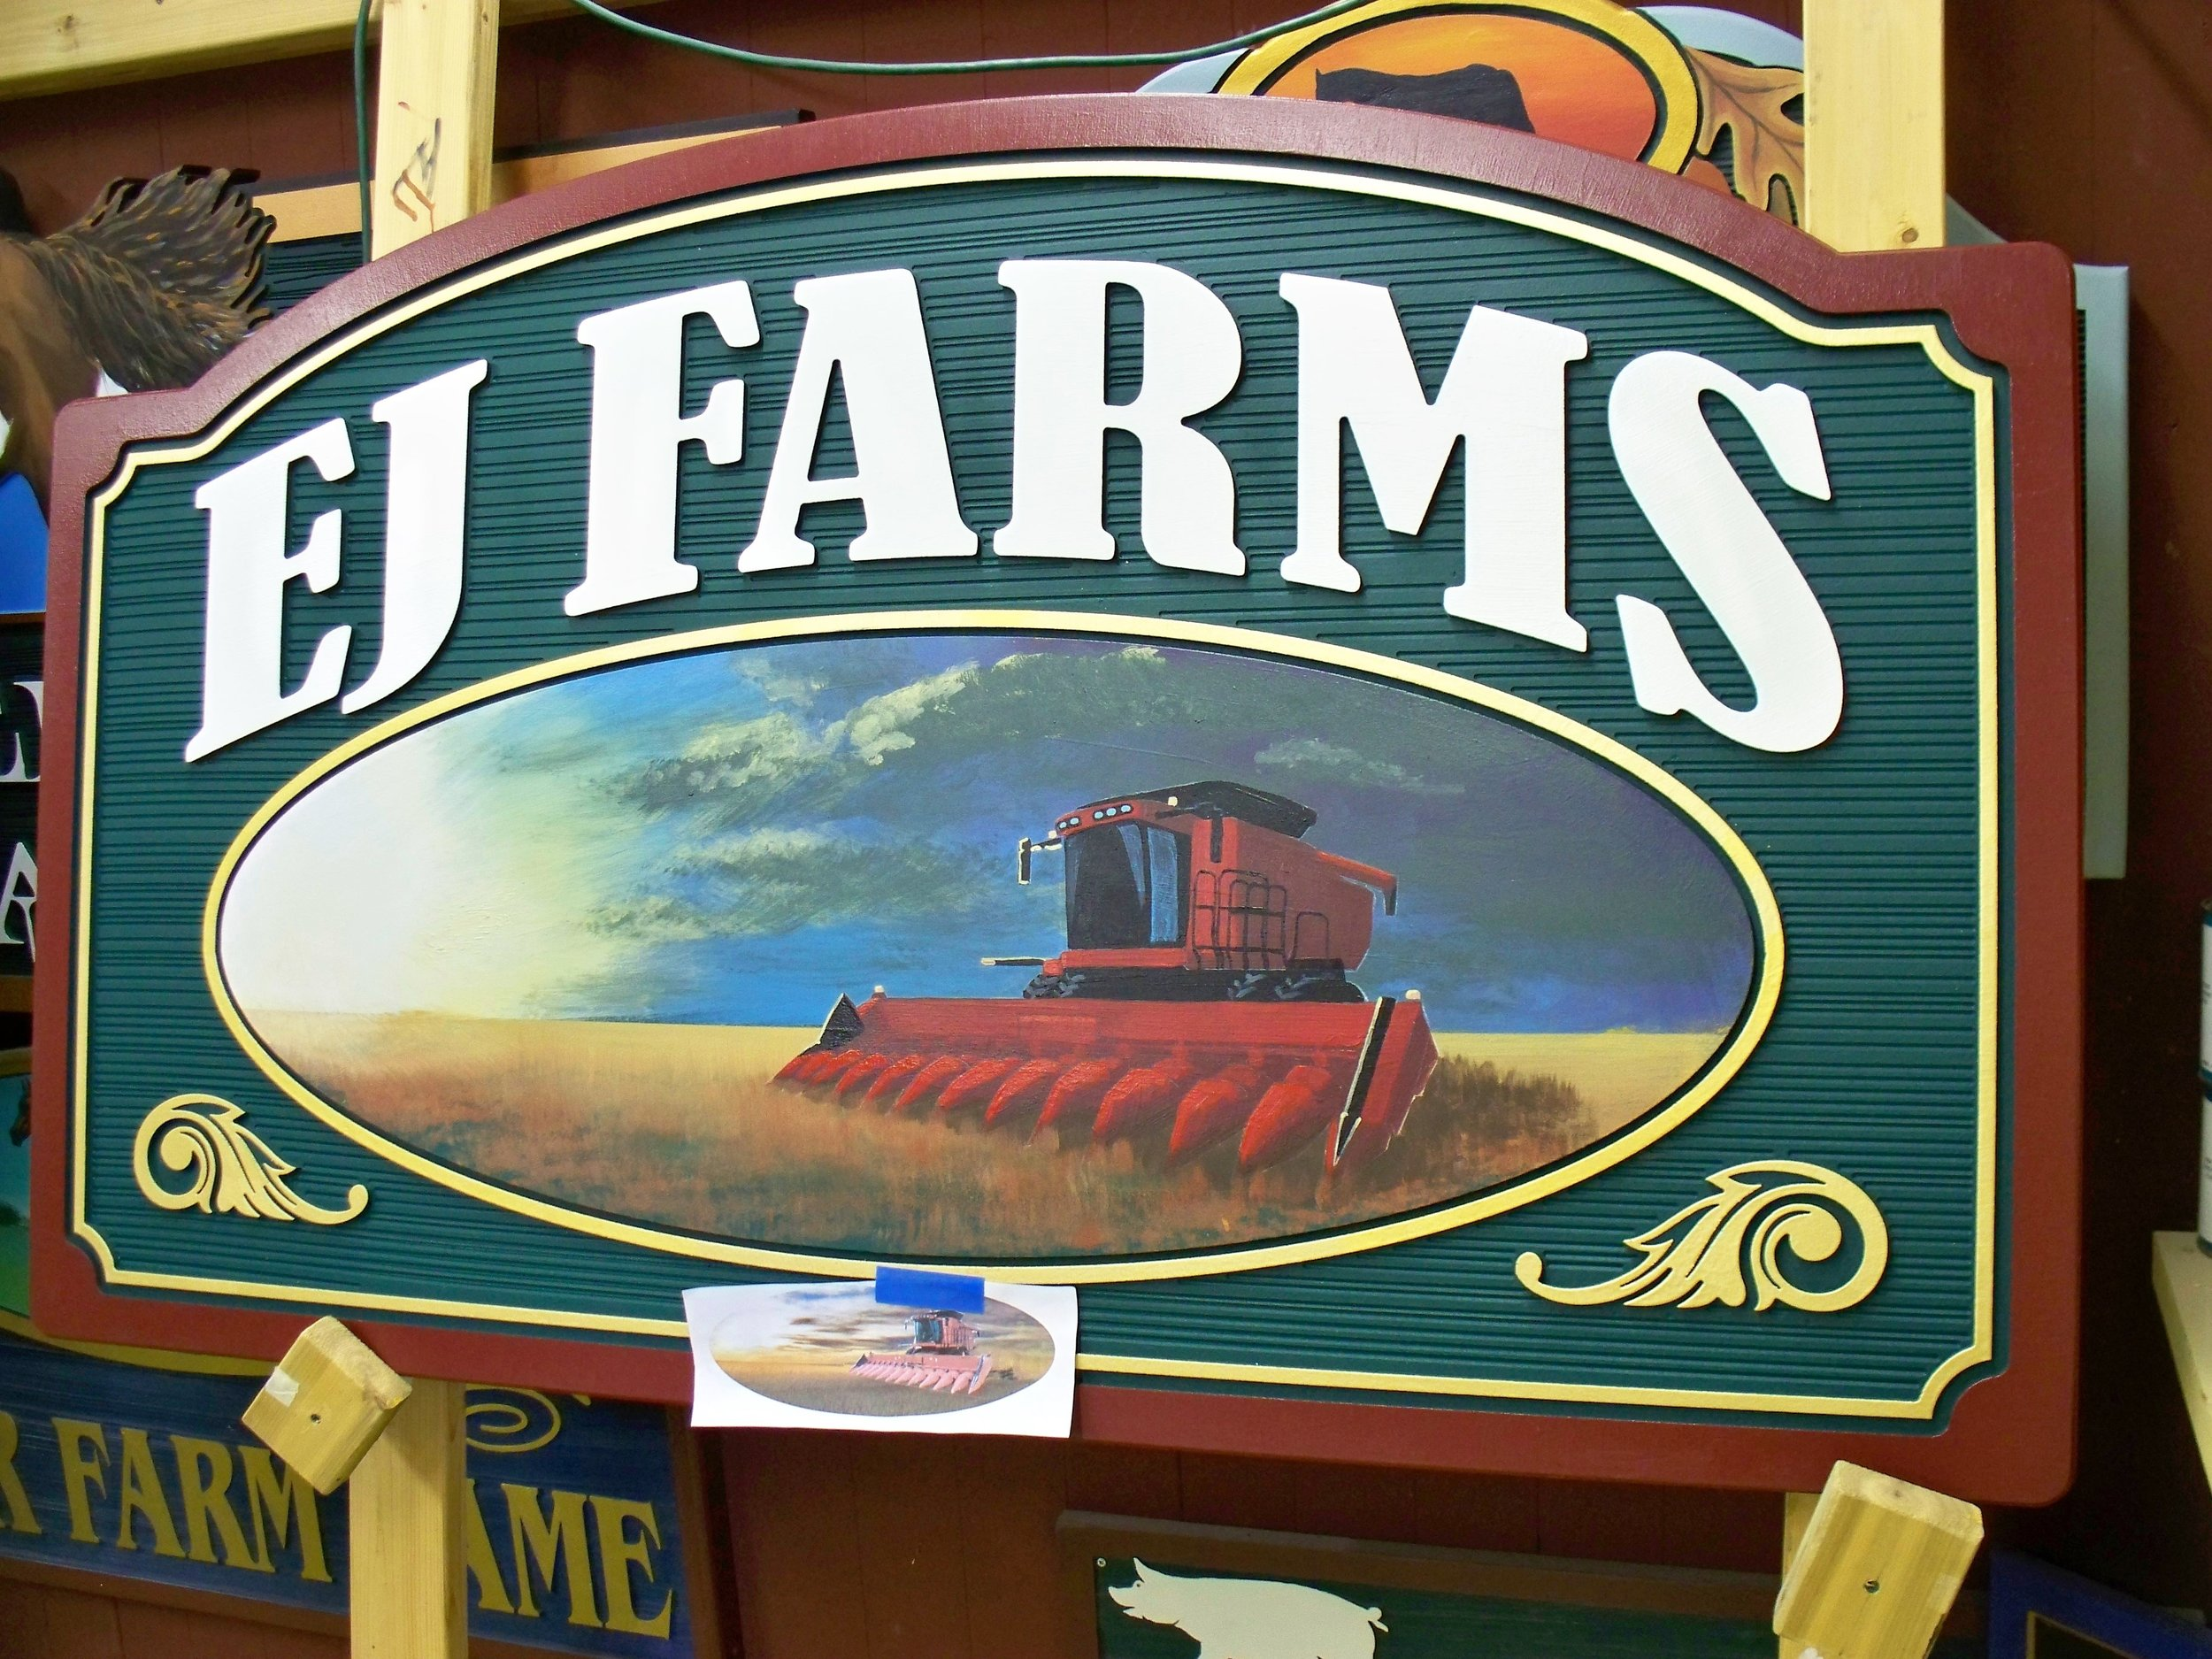 farm_ej_farms.jpg